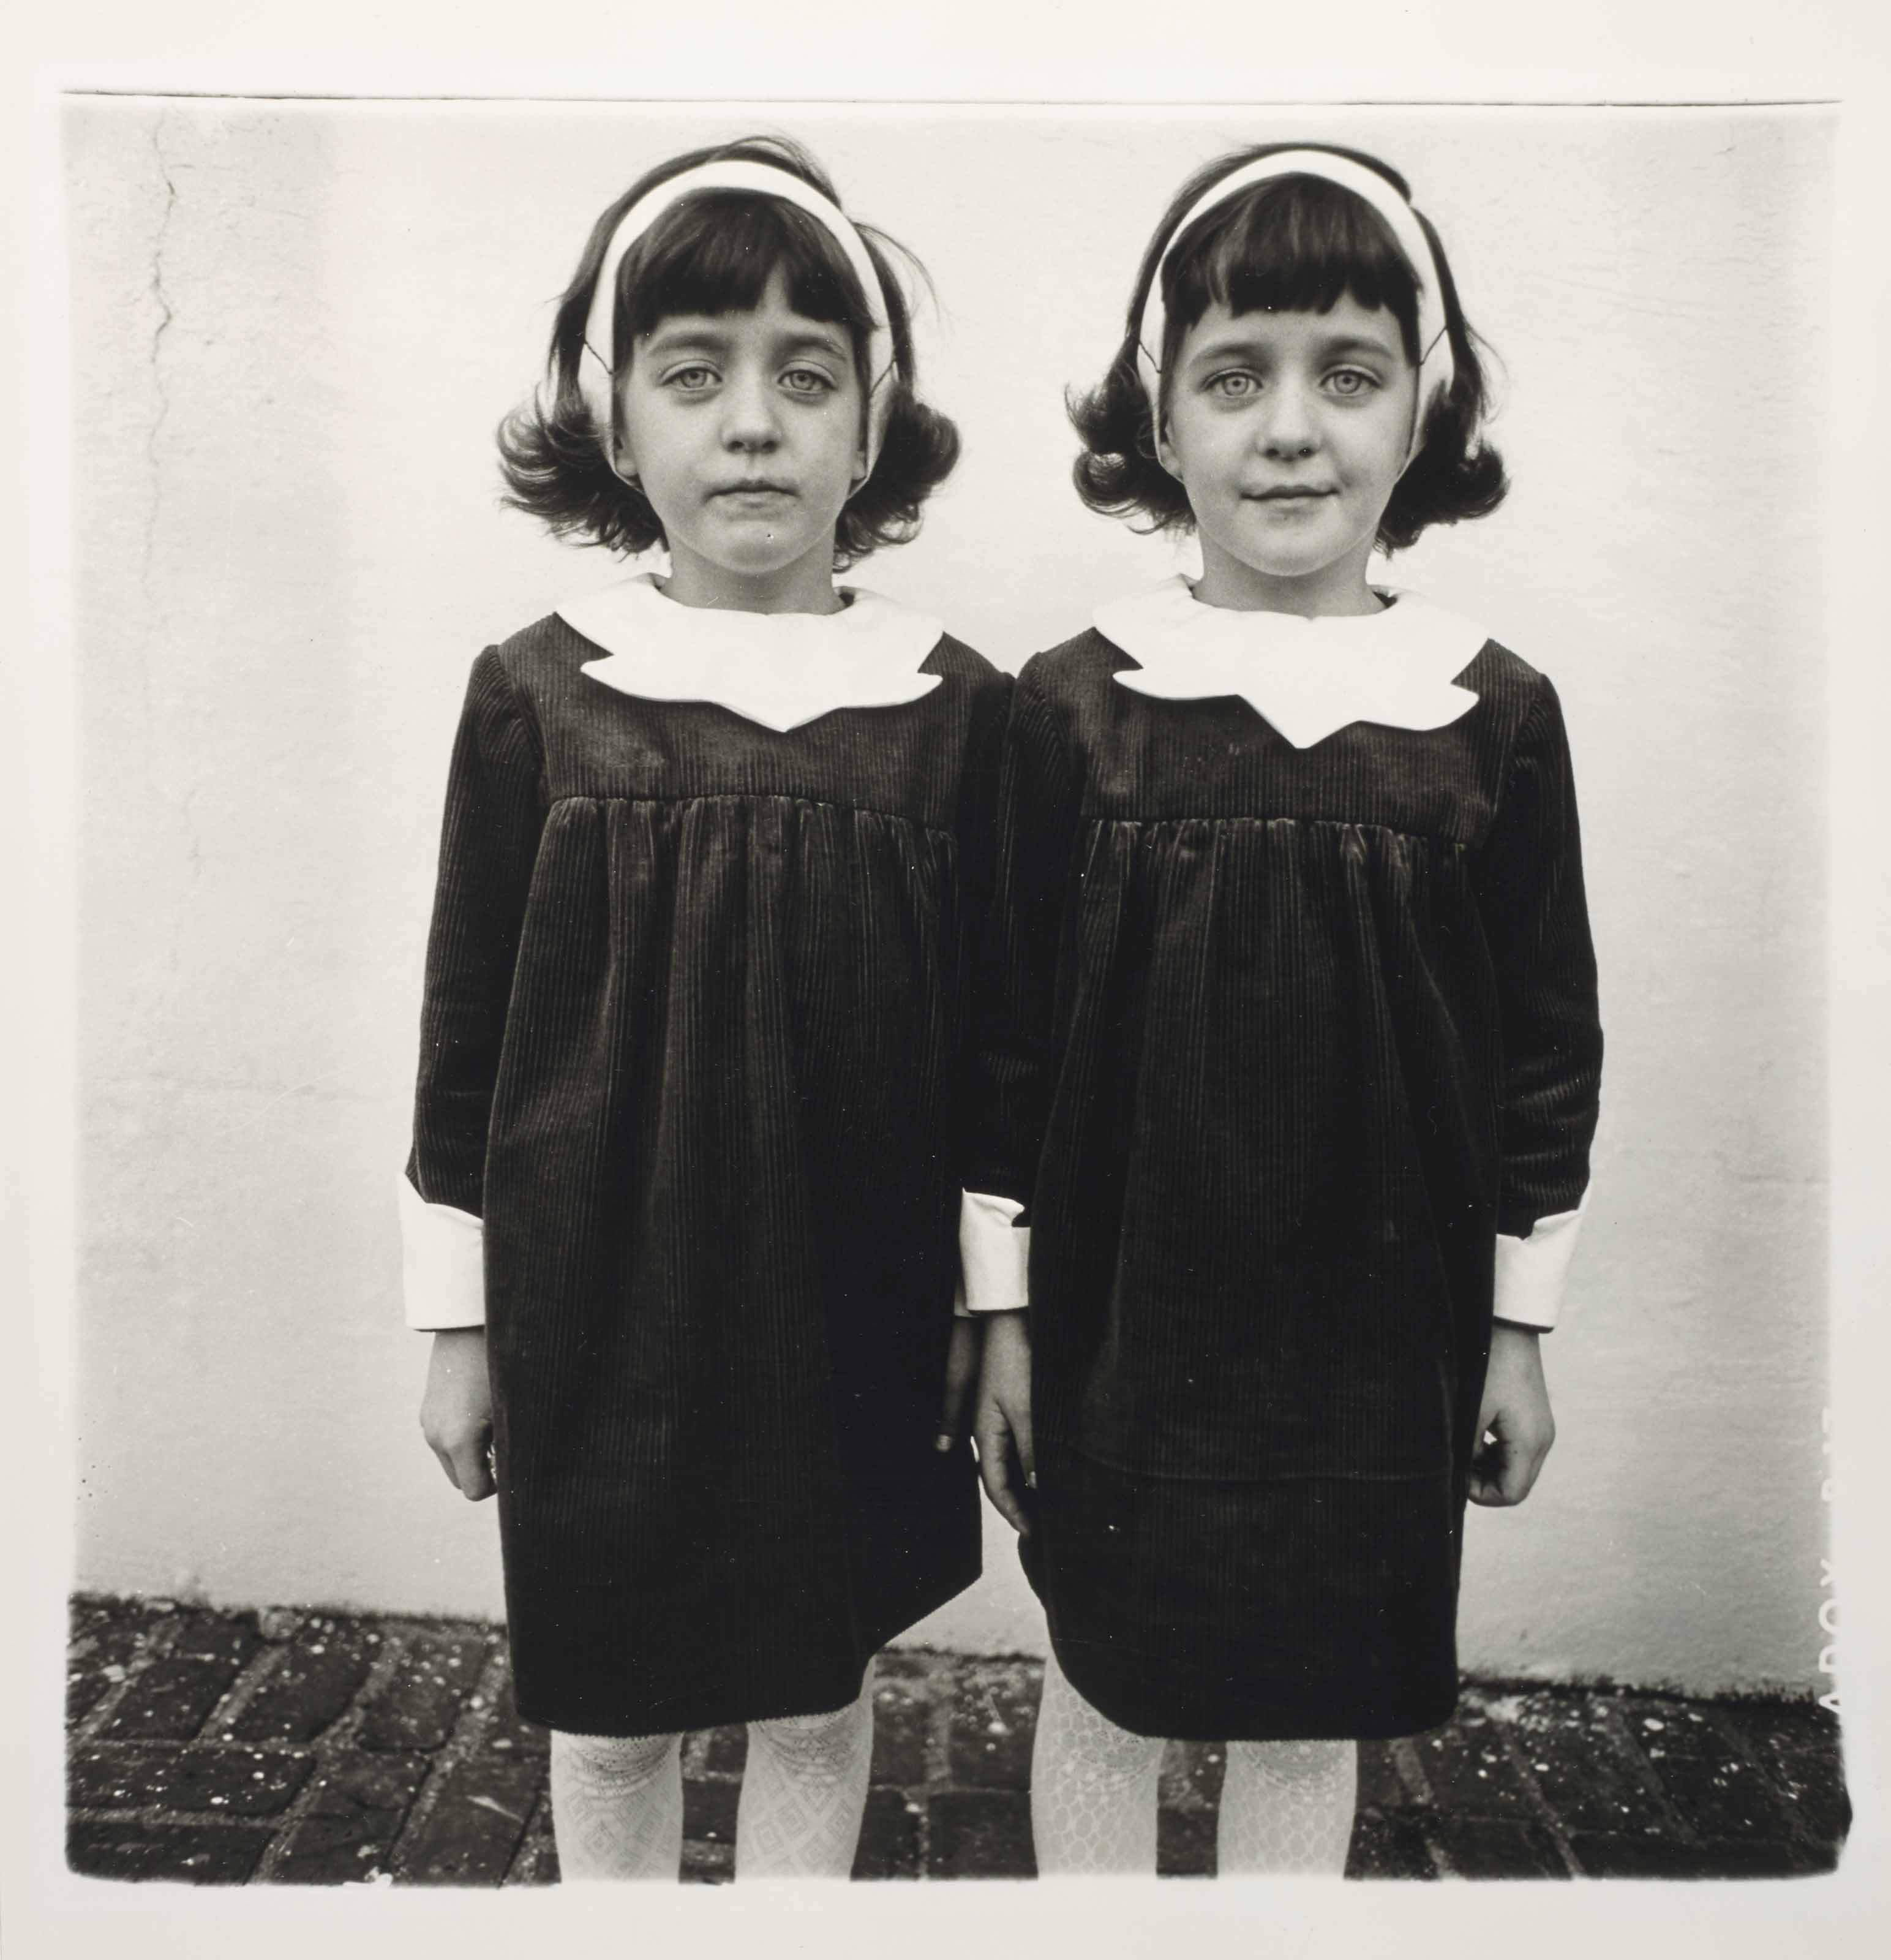 Identical twins, Roselle, N.J, 1966